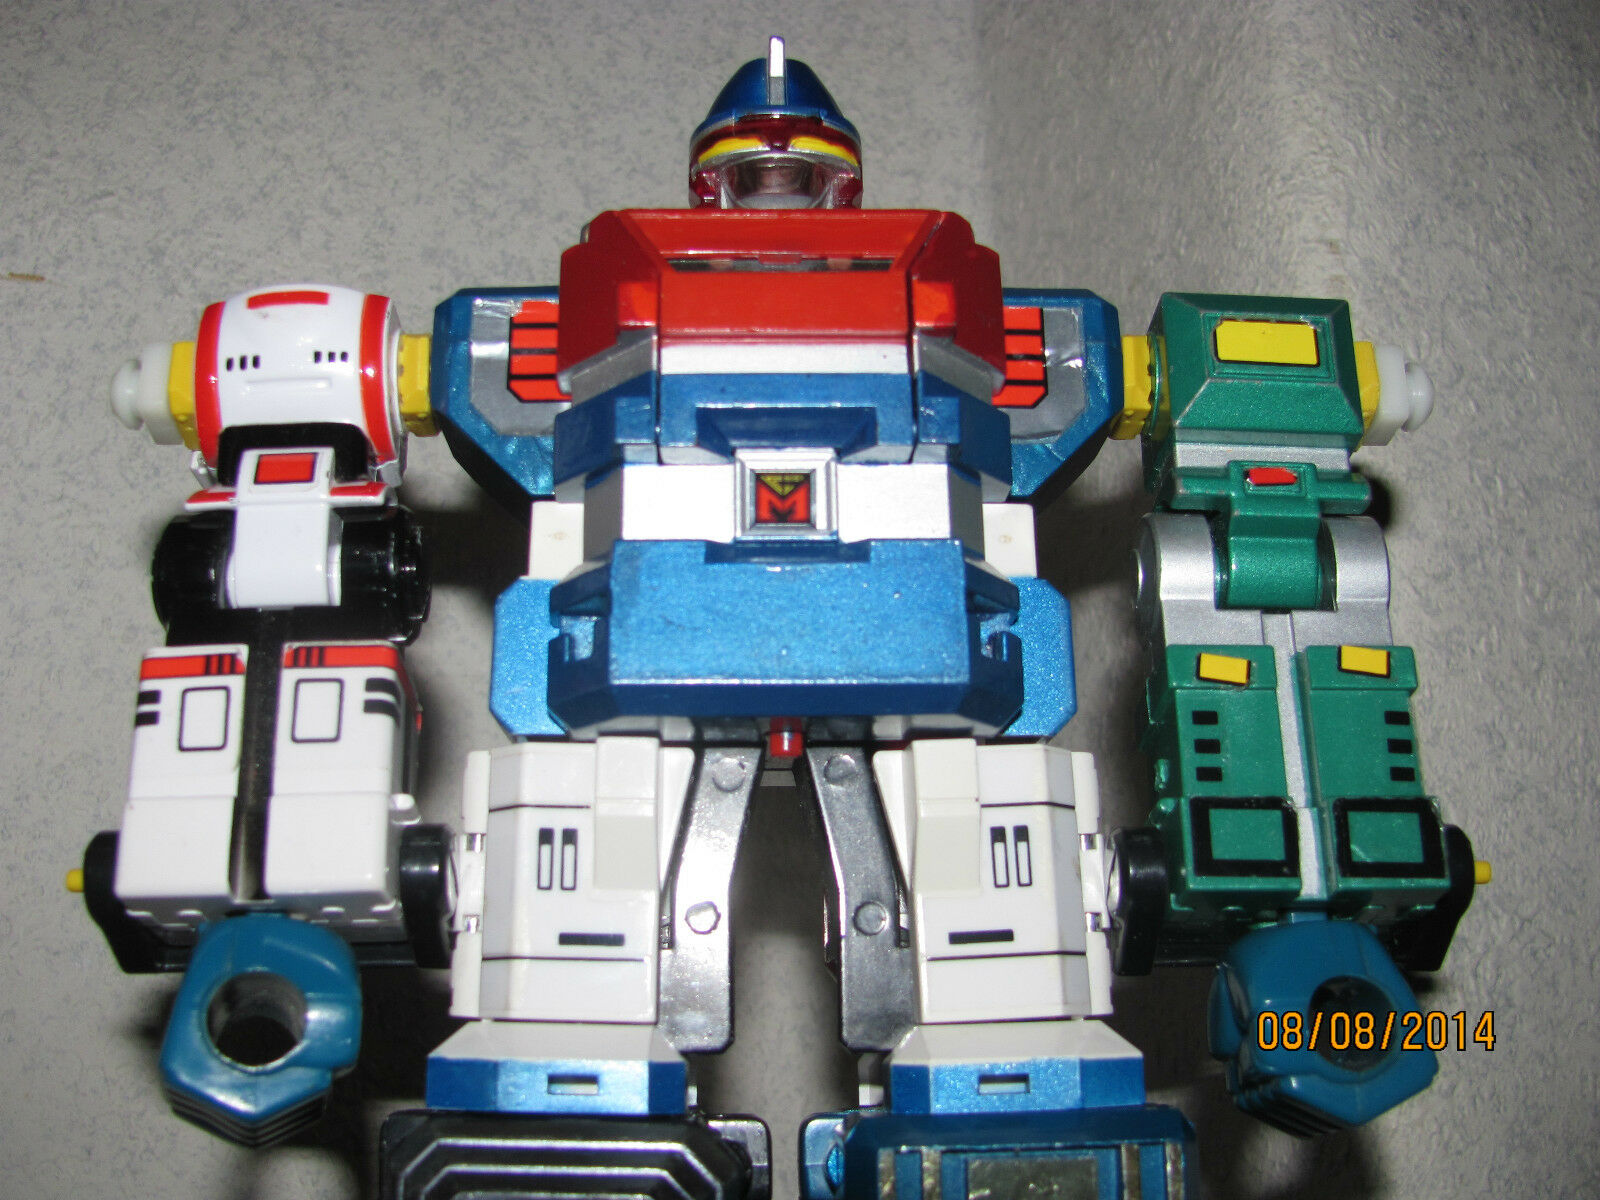 Robot God Mars DX  Popy del '76 made in Japan